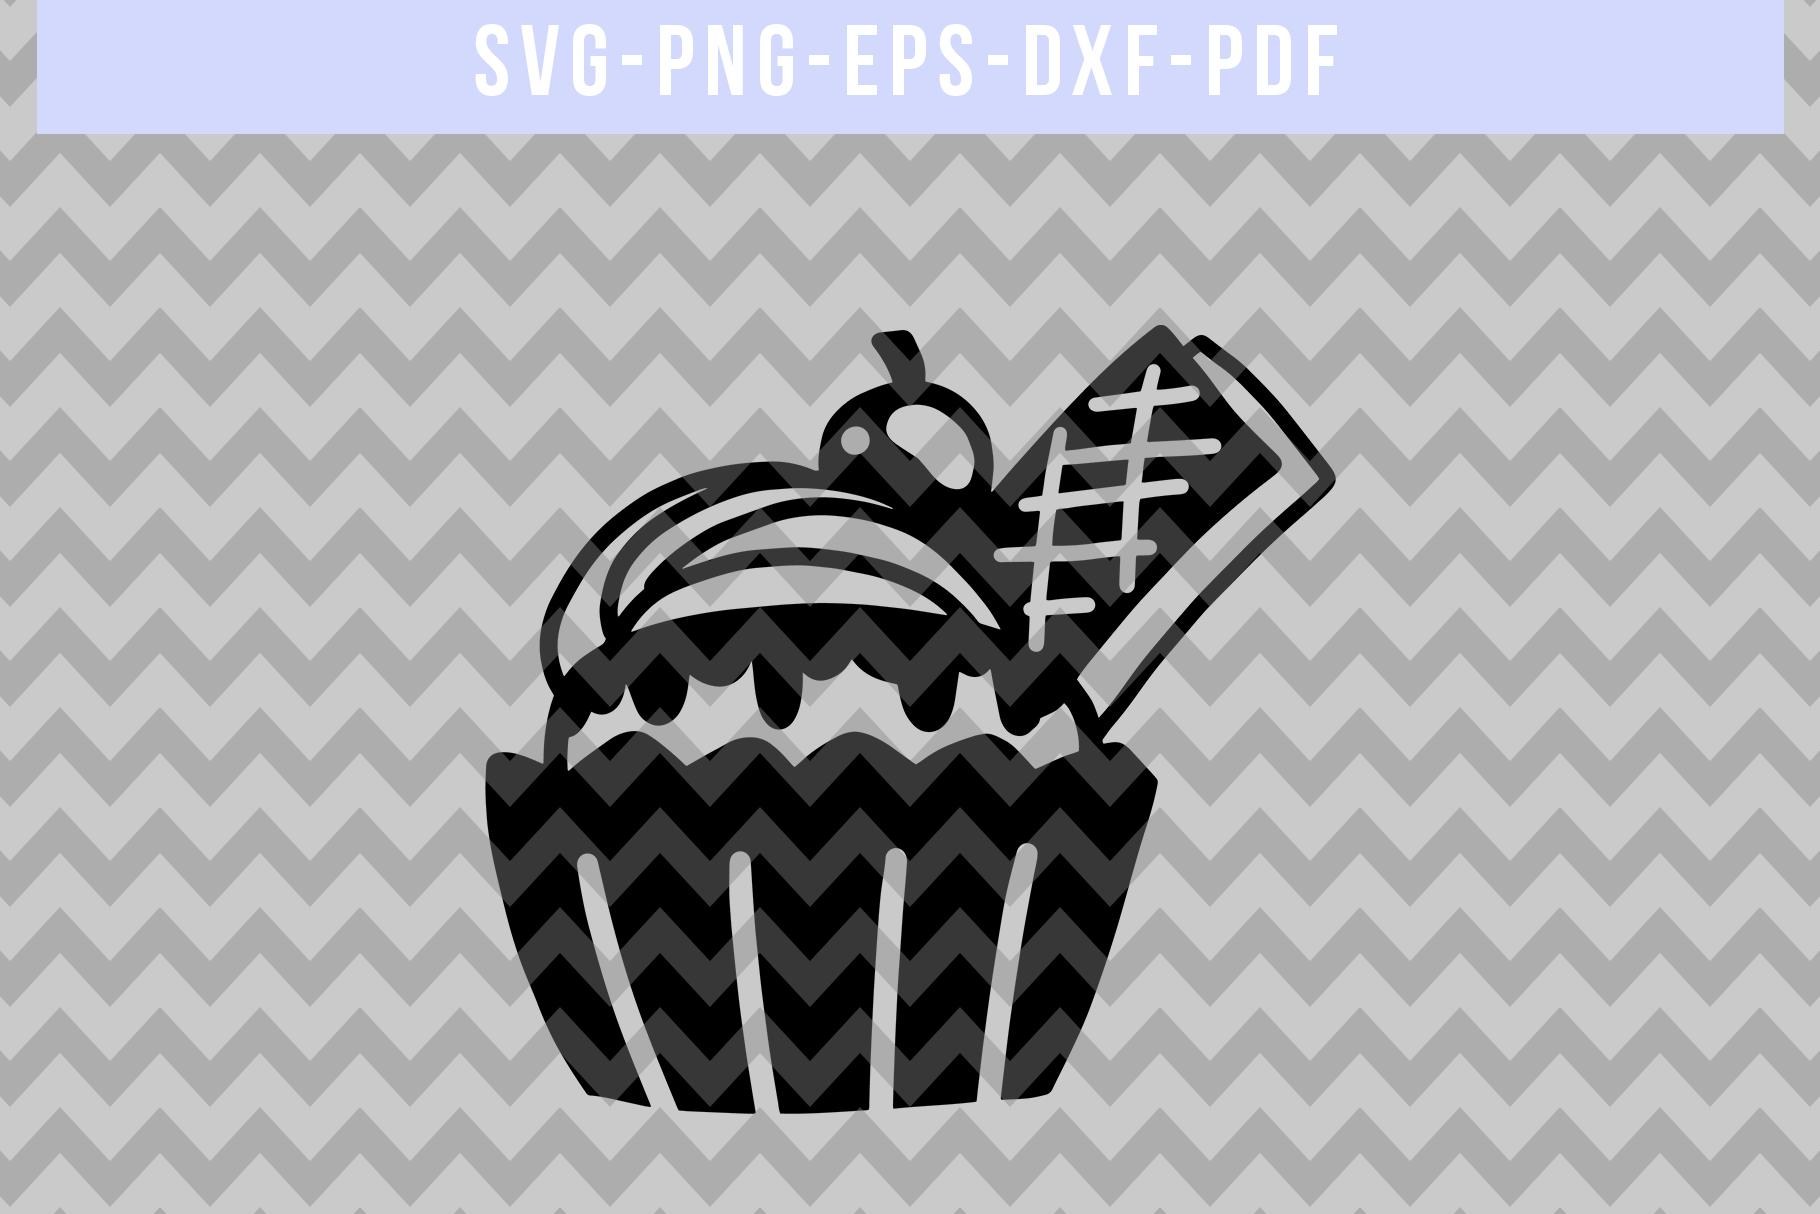 Waffel Cupcake Papercut Template, Birthday Cut File SVG PDF example image 4